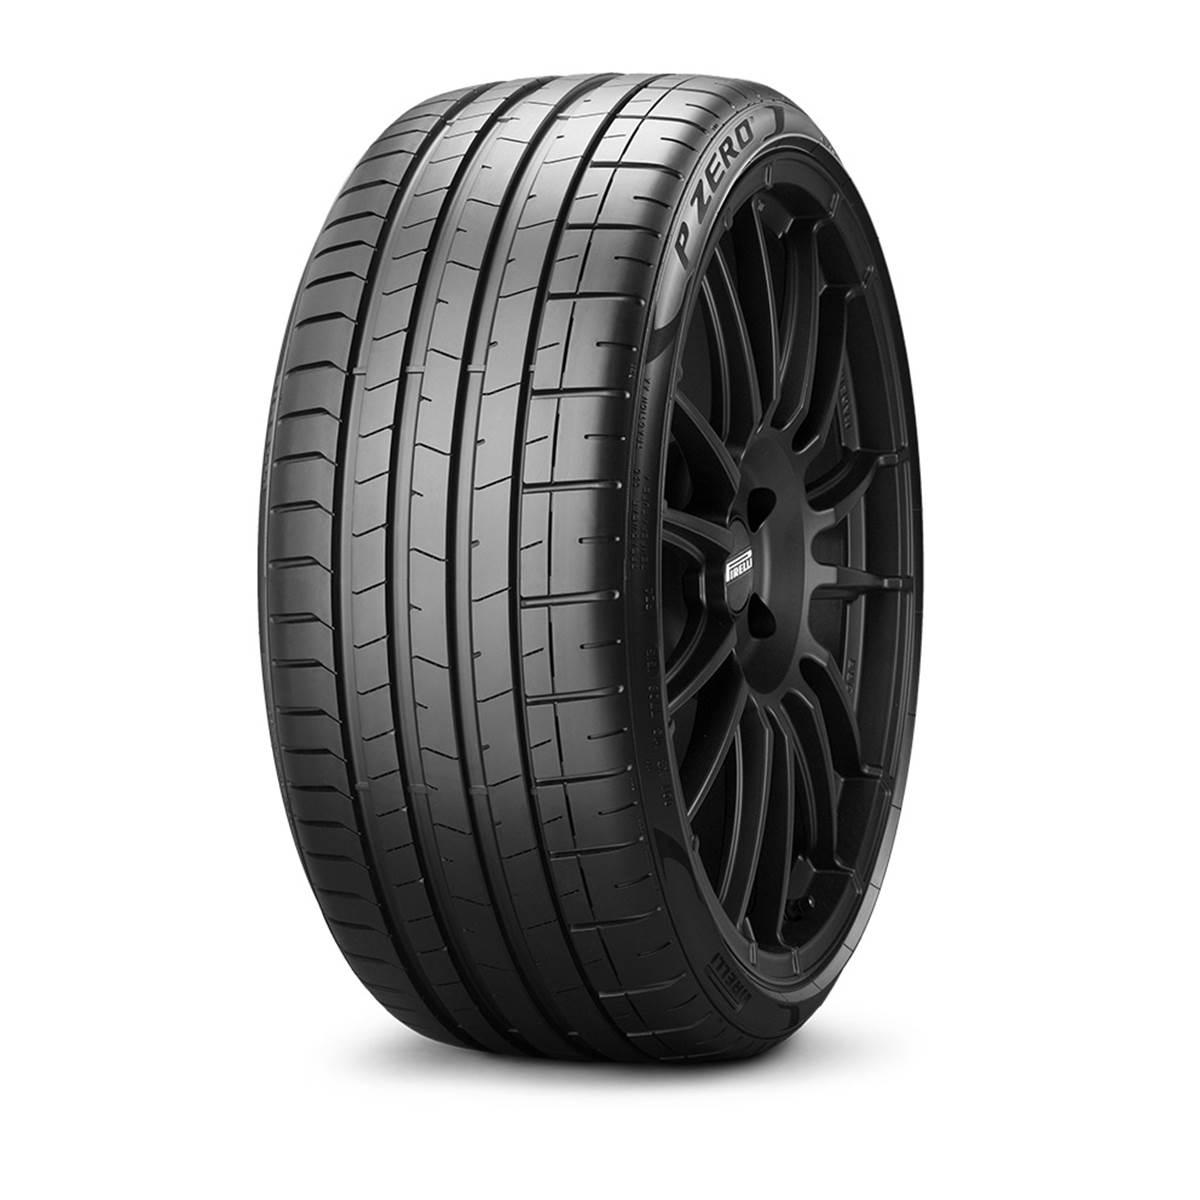 Pneu Pirelli 265/30R20 94Y Pzero Nero XL